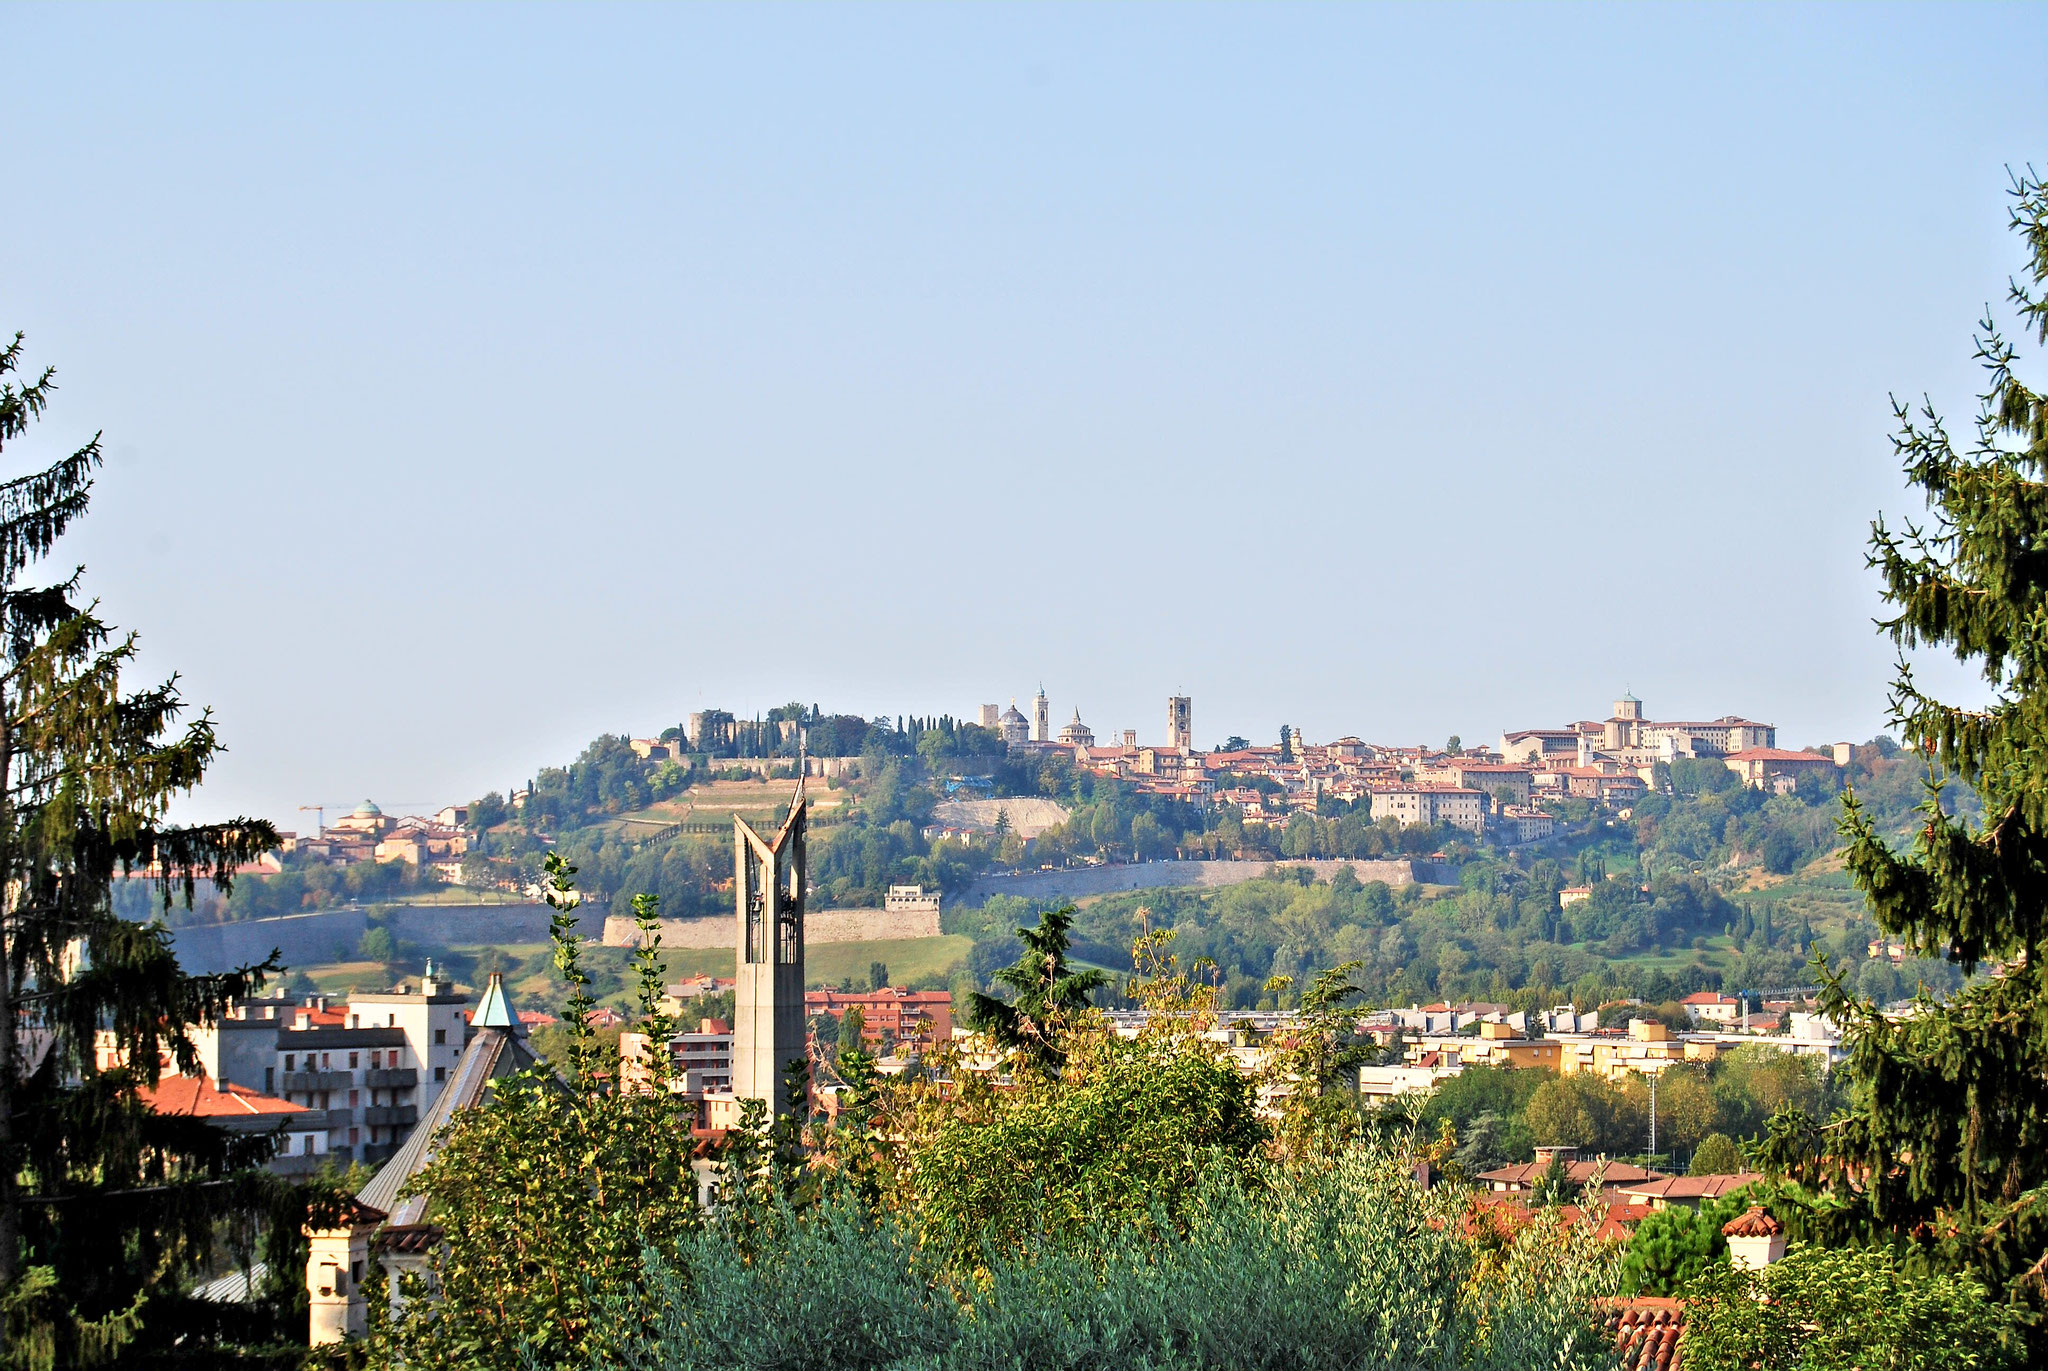 Vue sur Bergamo